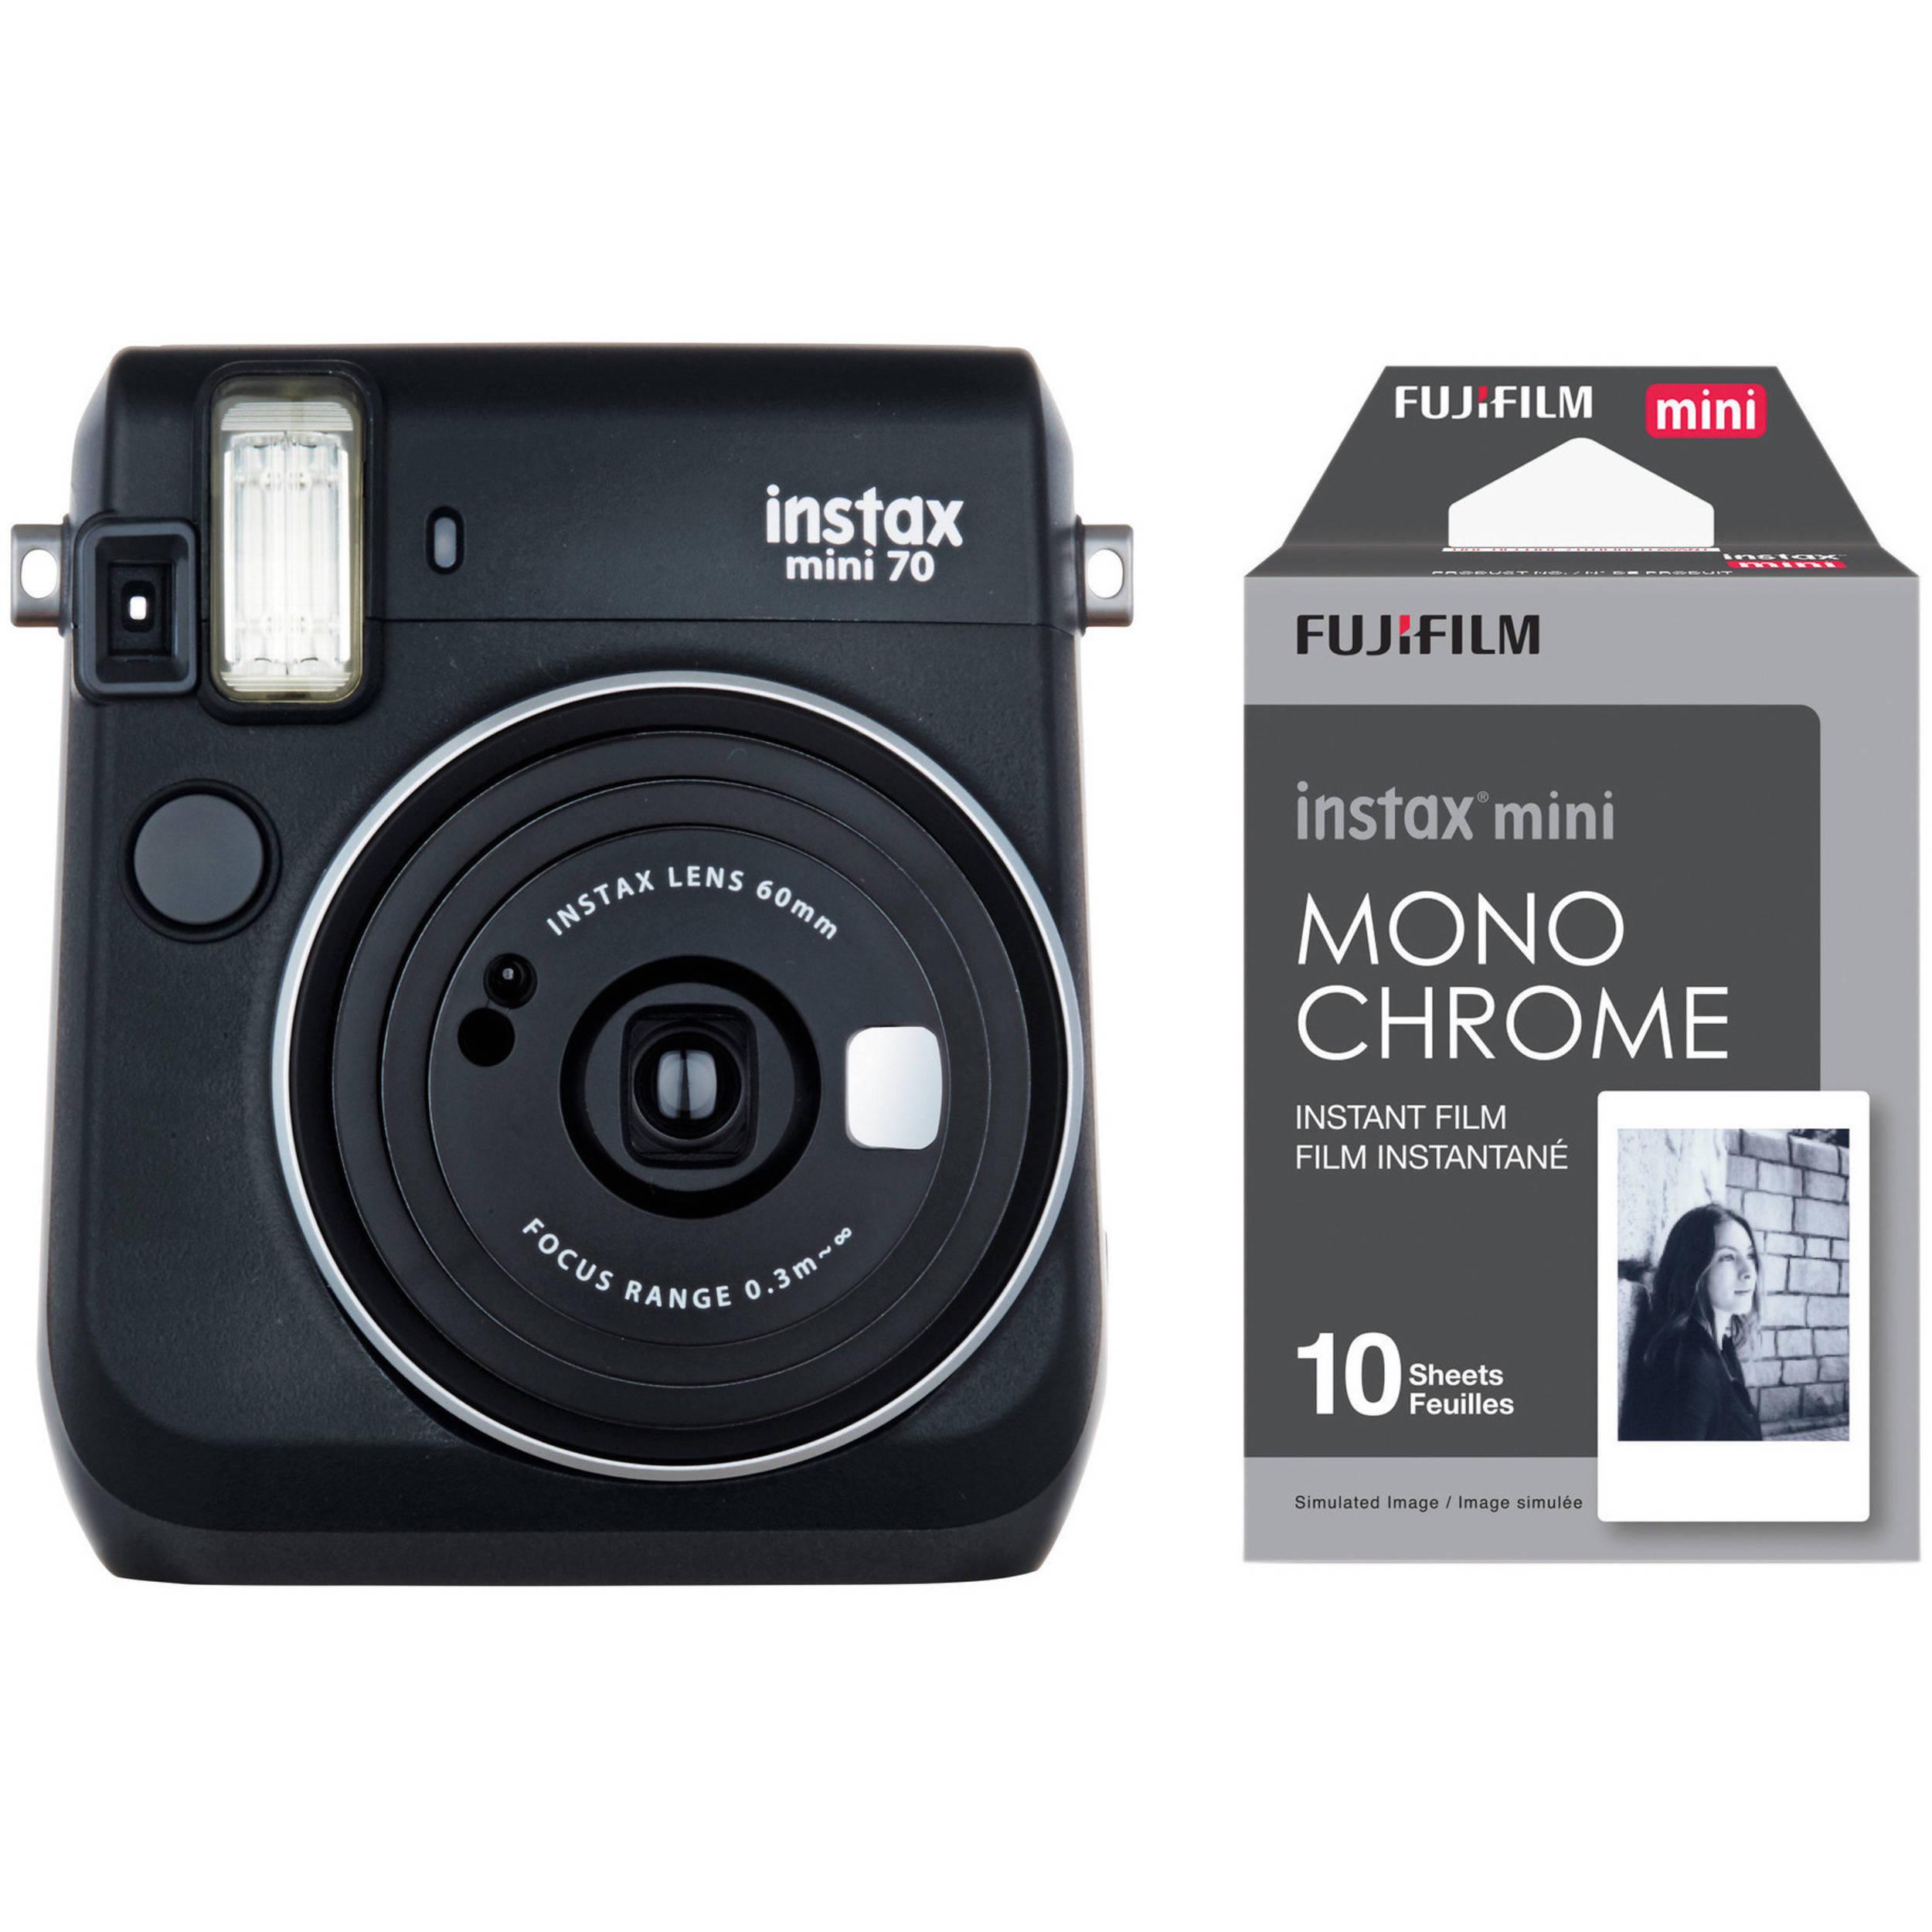 Fujifilm Instax Mini 70 Instant Camera Boasts Selfie Mode